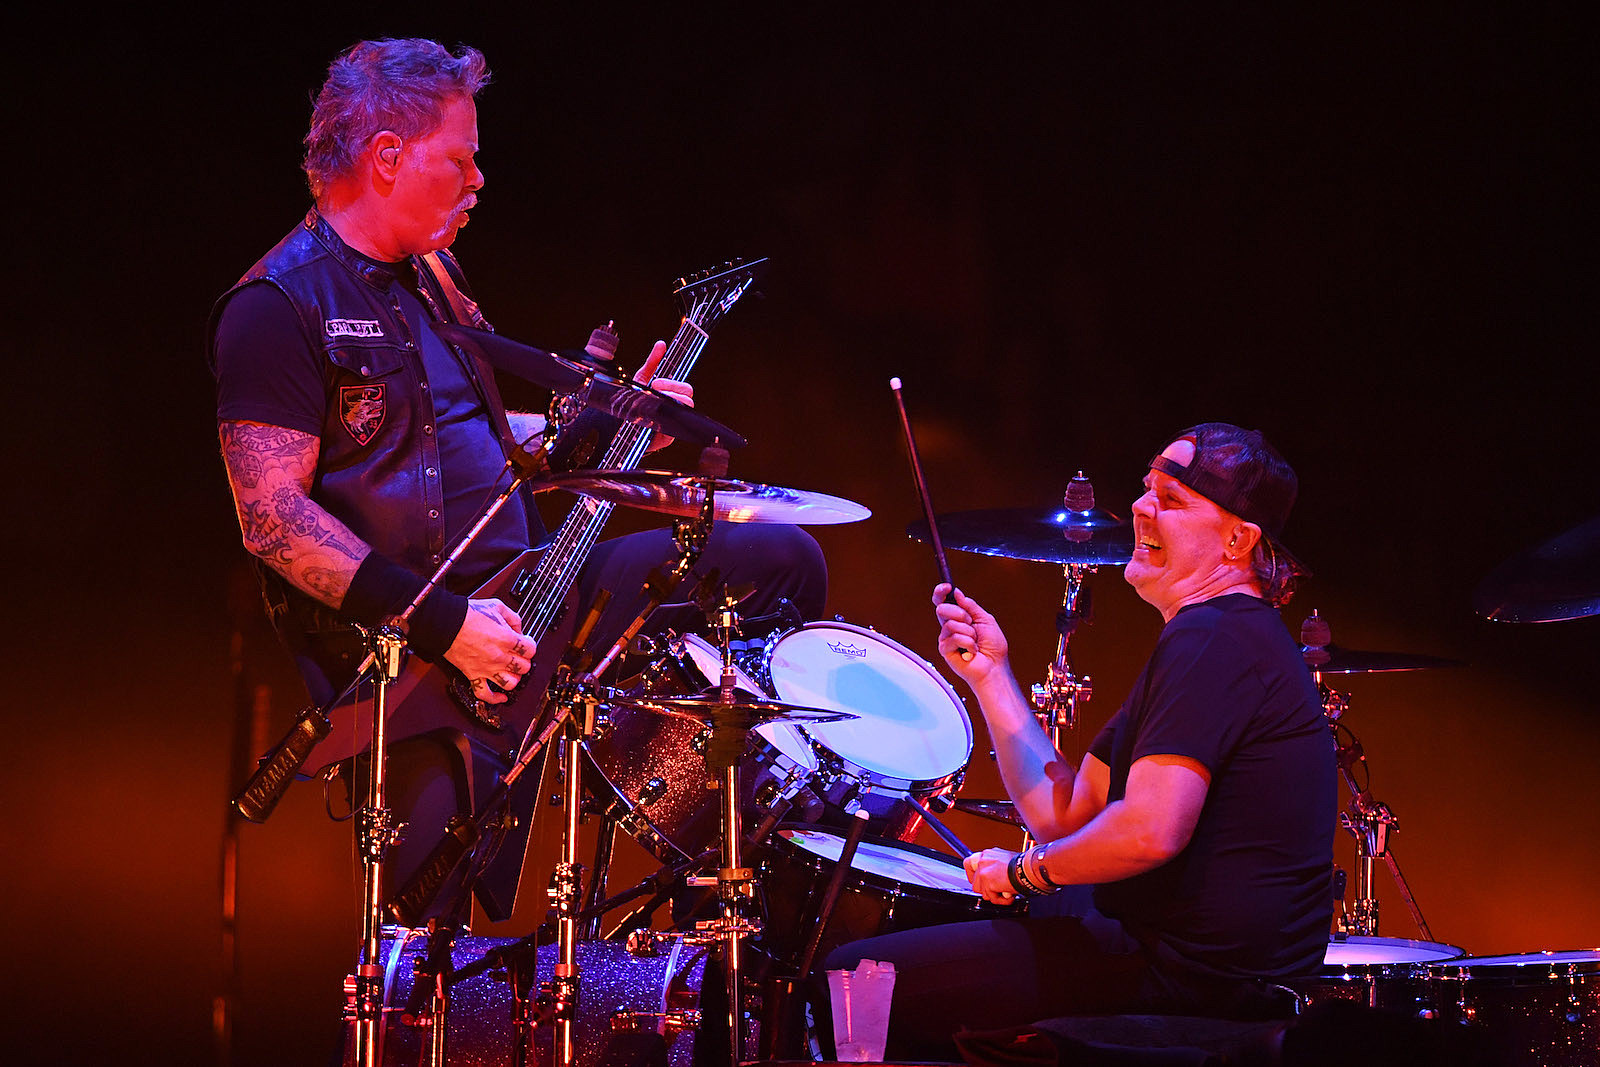 Metallica Shake Up Set List for European 'Worldwired' Tour Opener